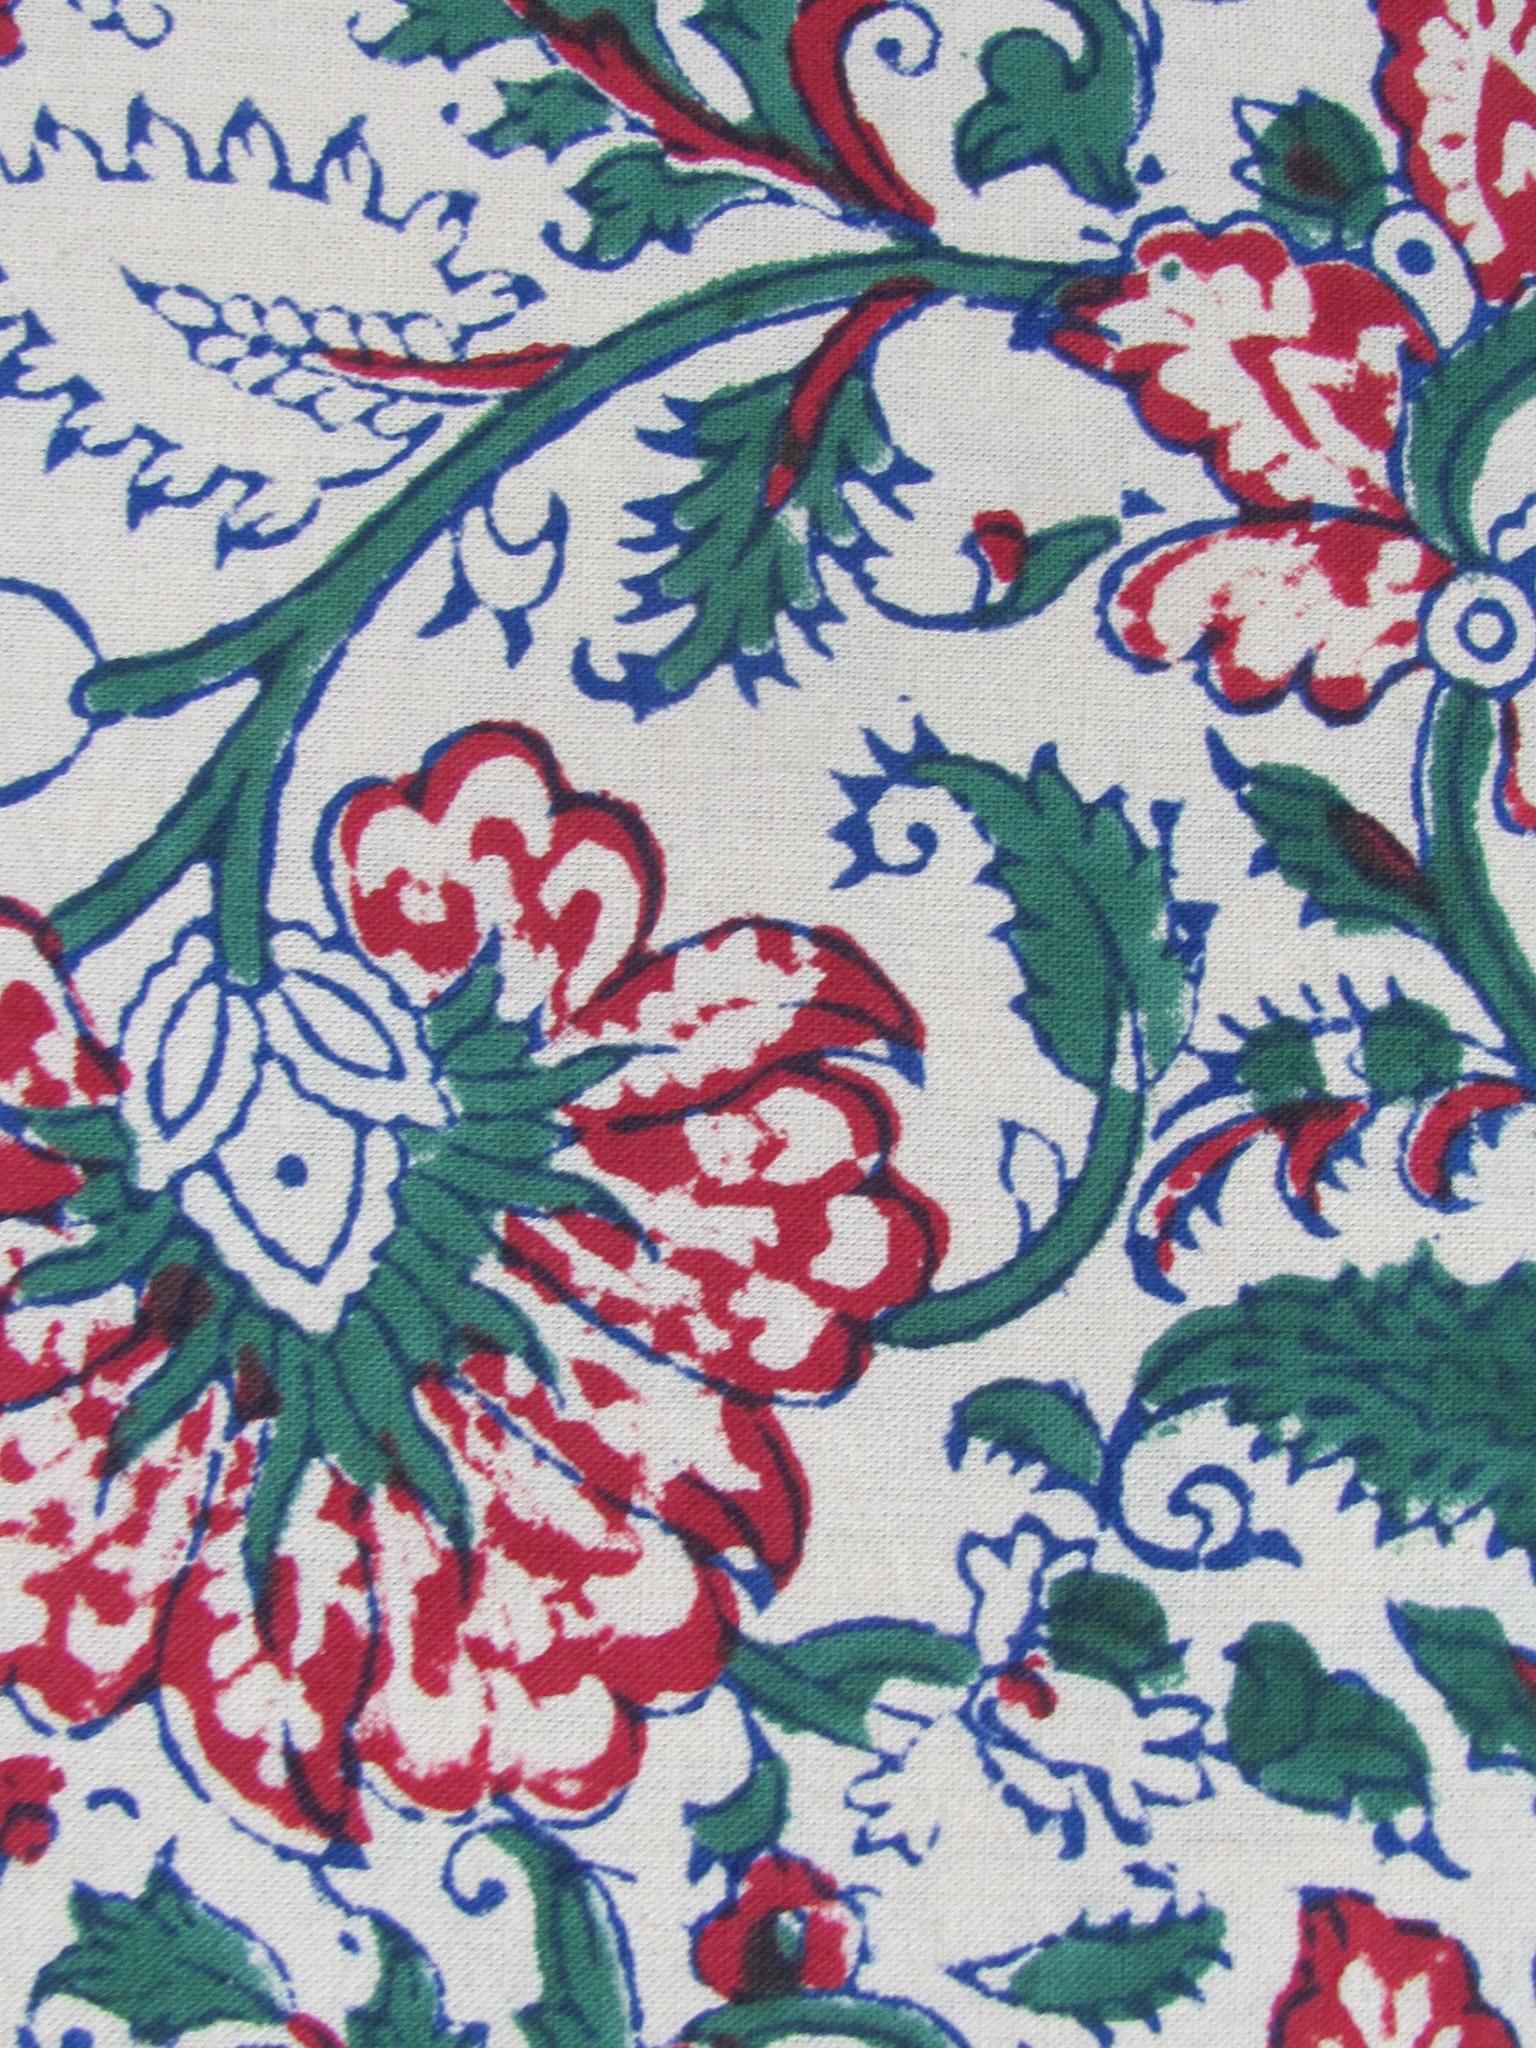 Bedsheet, Multipurpose yoga/picnic/table cloth/grand foulard